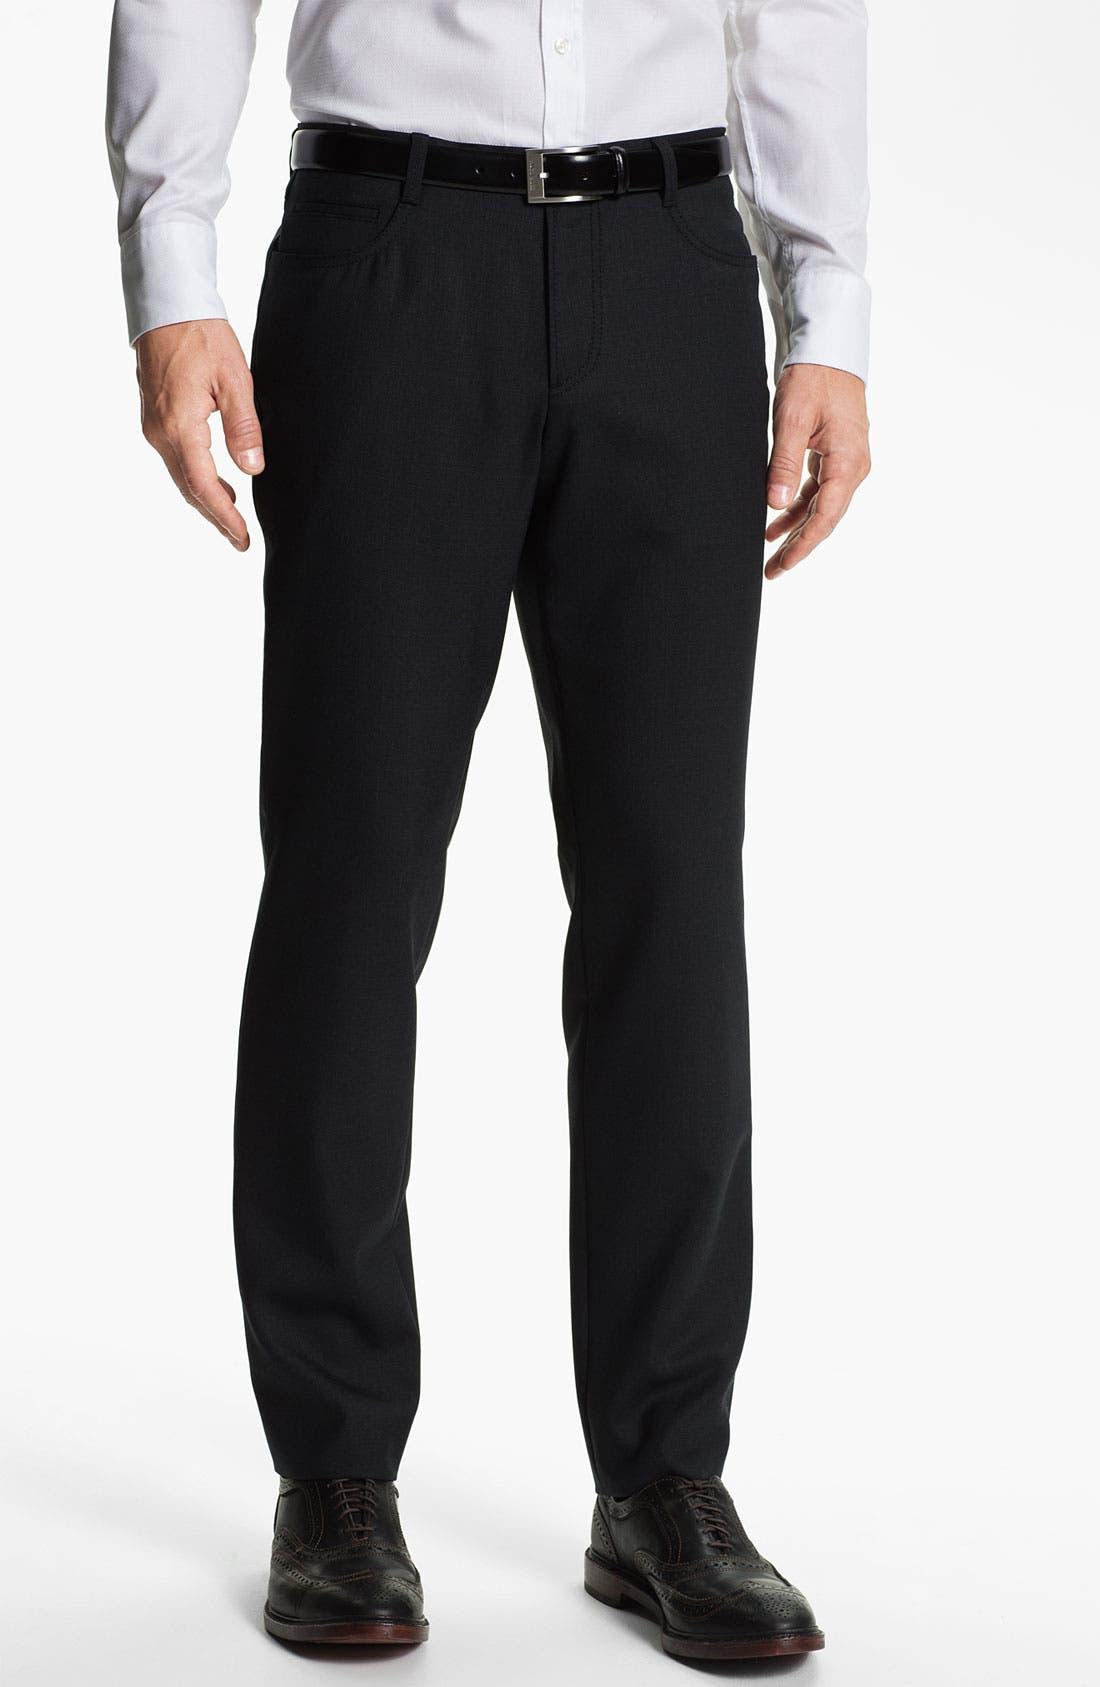 Alternate Image 1 Selected - BOSS Black 'Gebe' Five Pocket Trousers